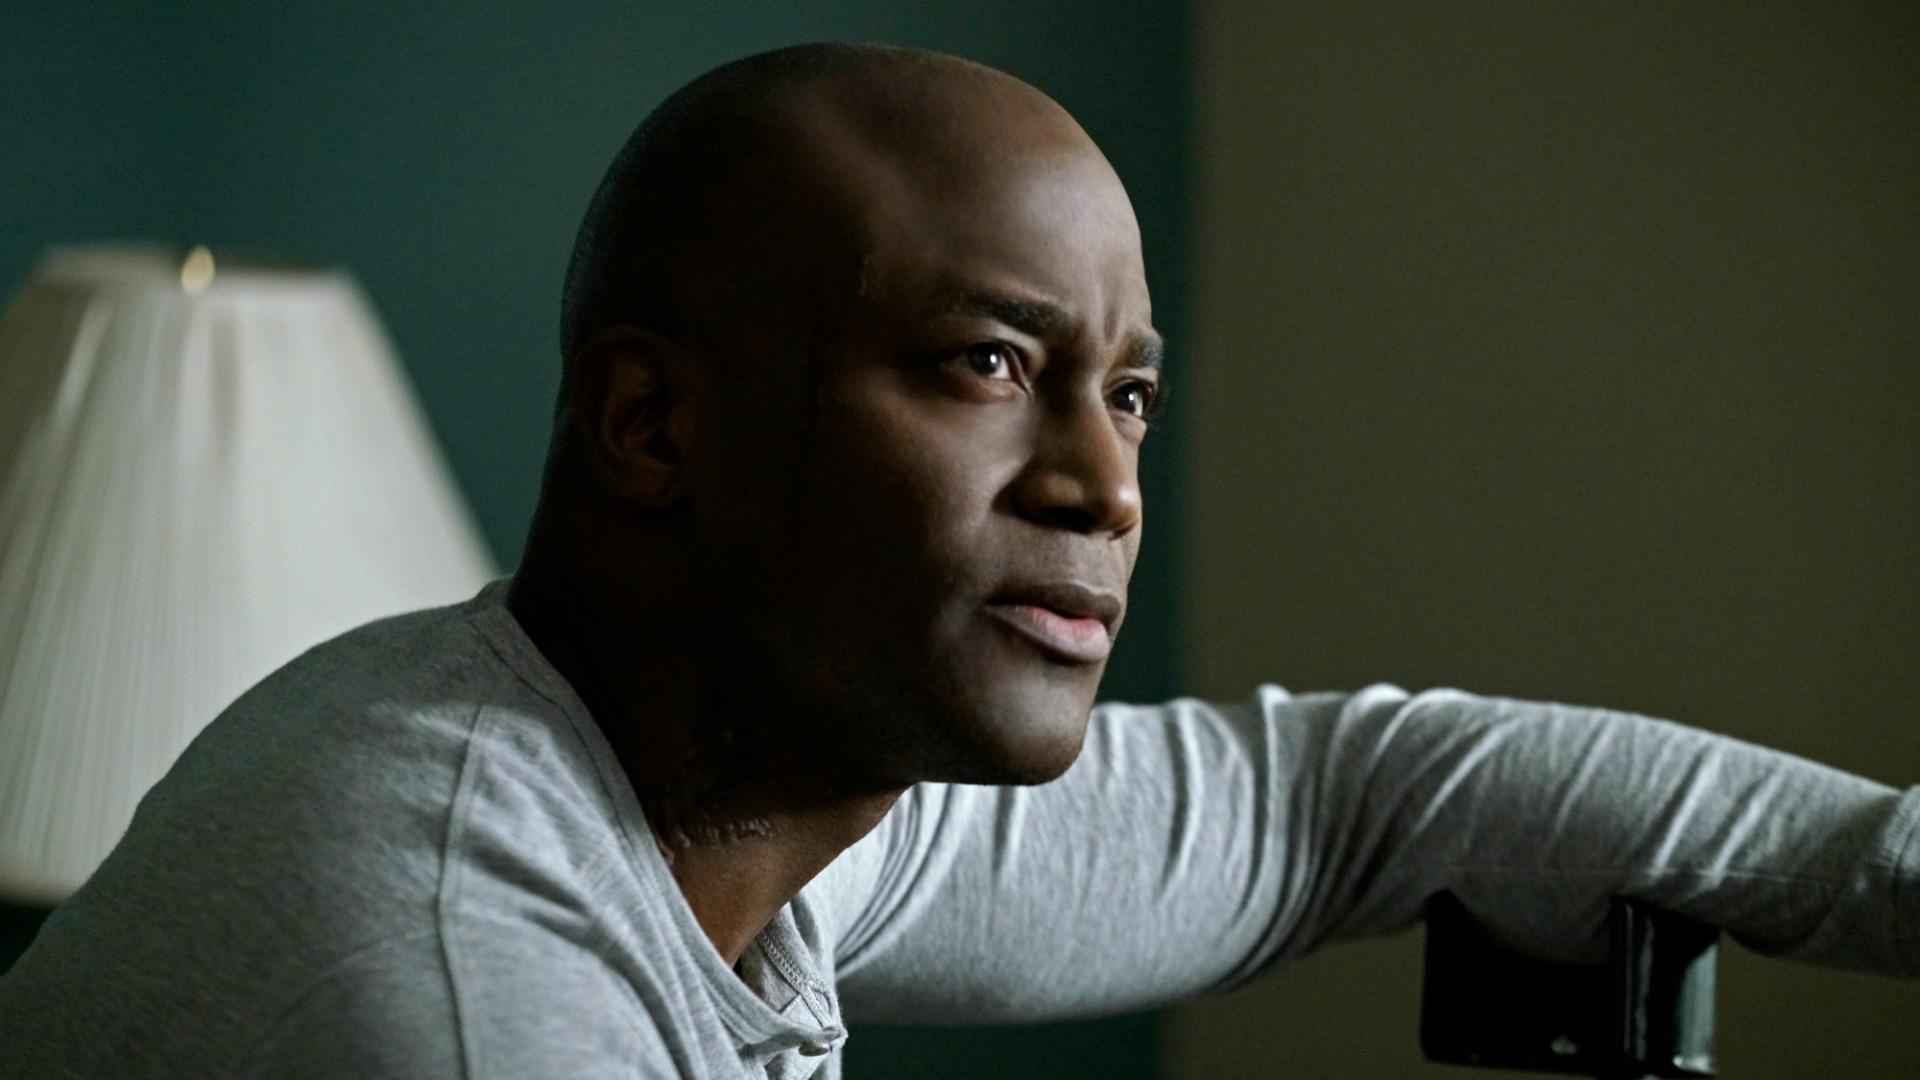 Taye Diggs as Gunnery Sergeant Aaron Davis